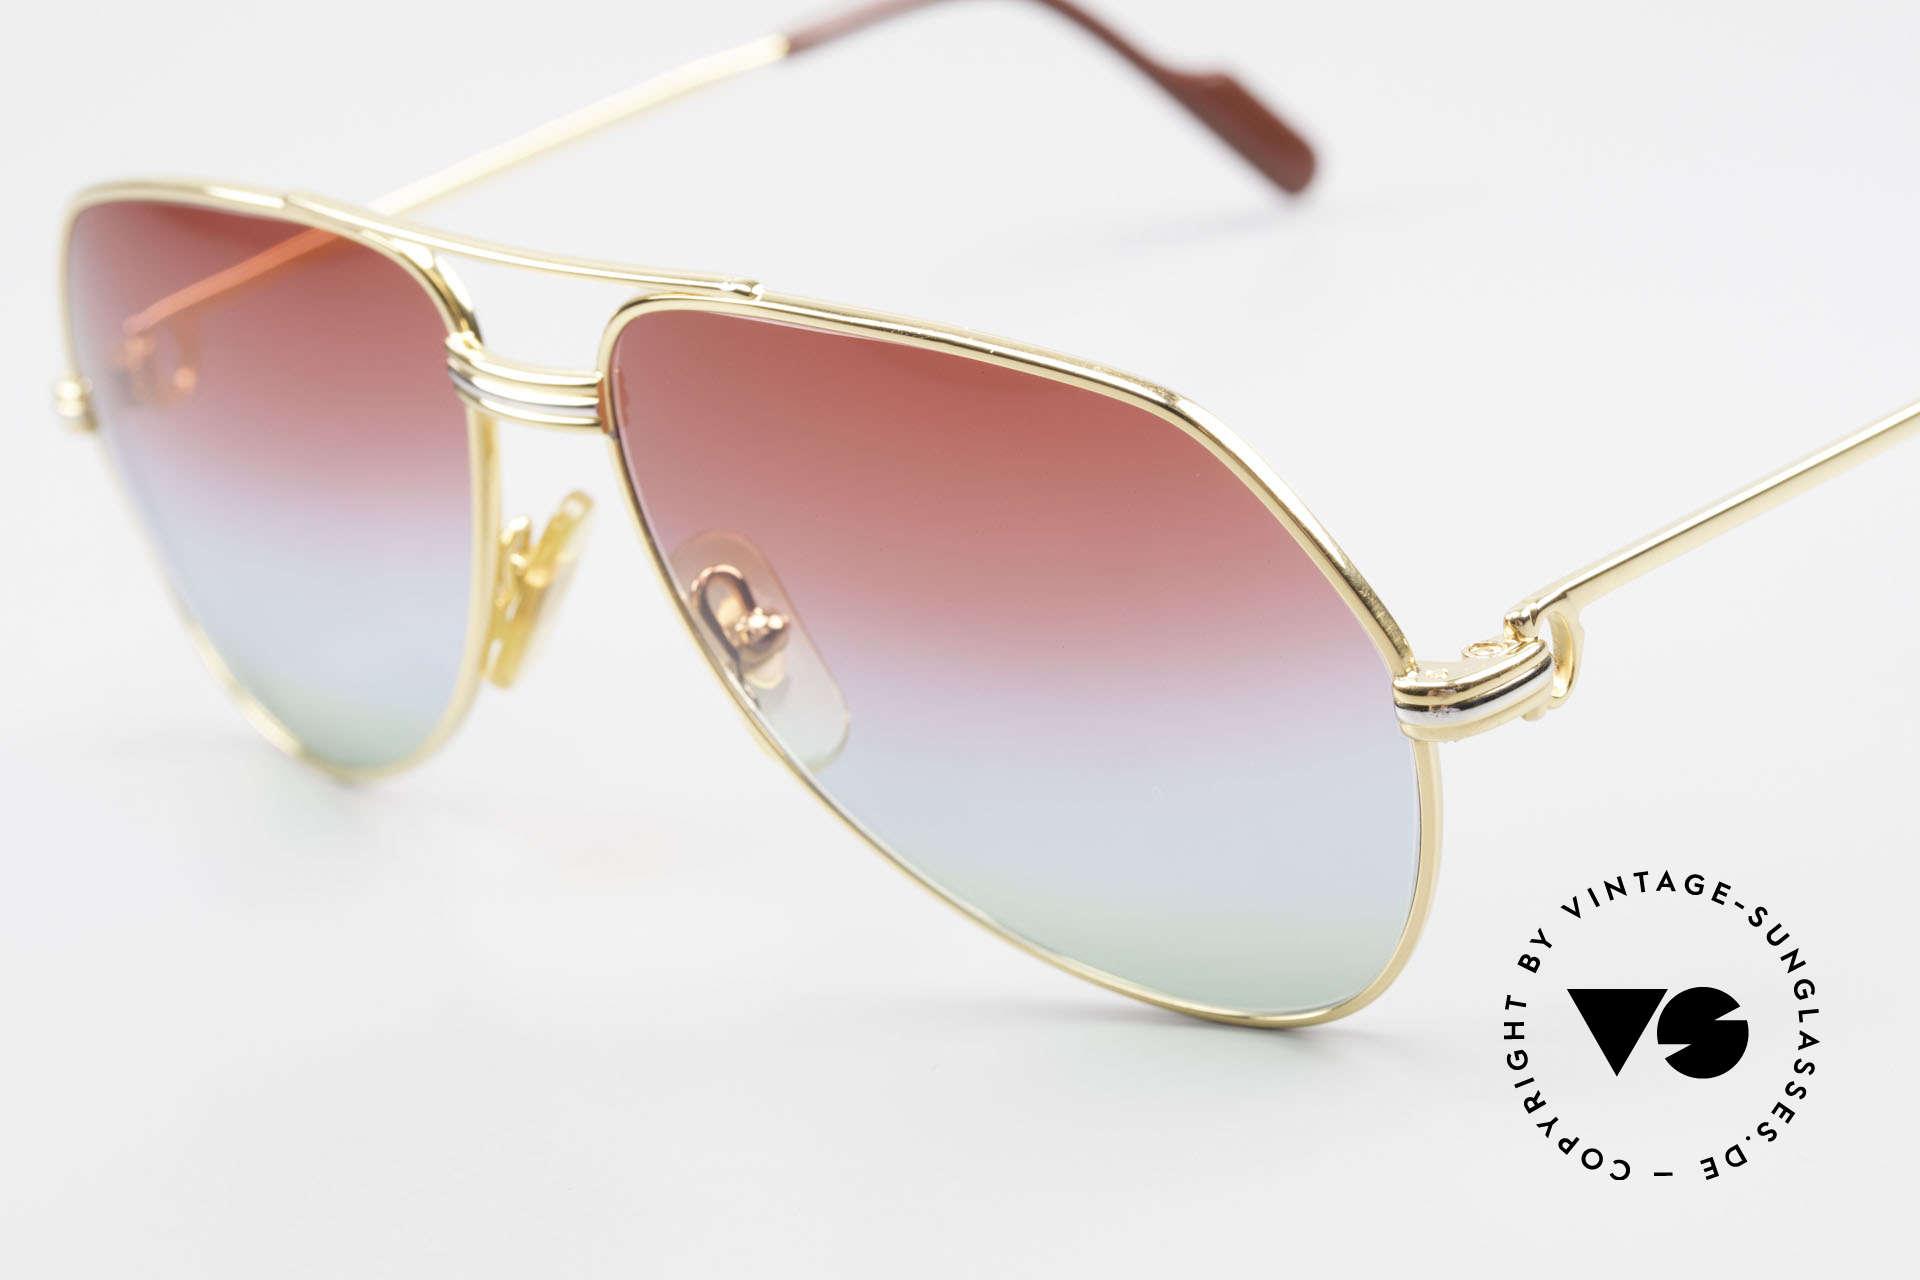 Cartier Vendome LC - S 1980's Sunglasses Tricolored, new fancy triple-gradient sun lenses (like polar lights), Made for Men and Women